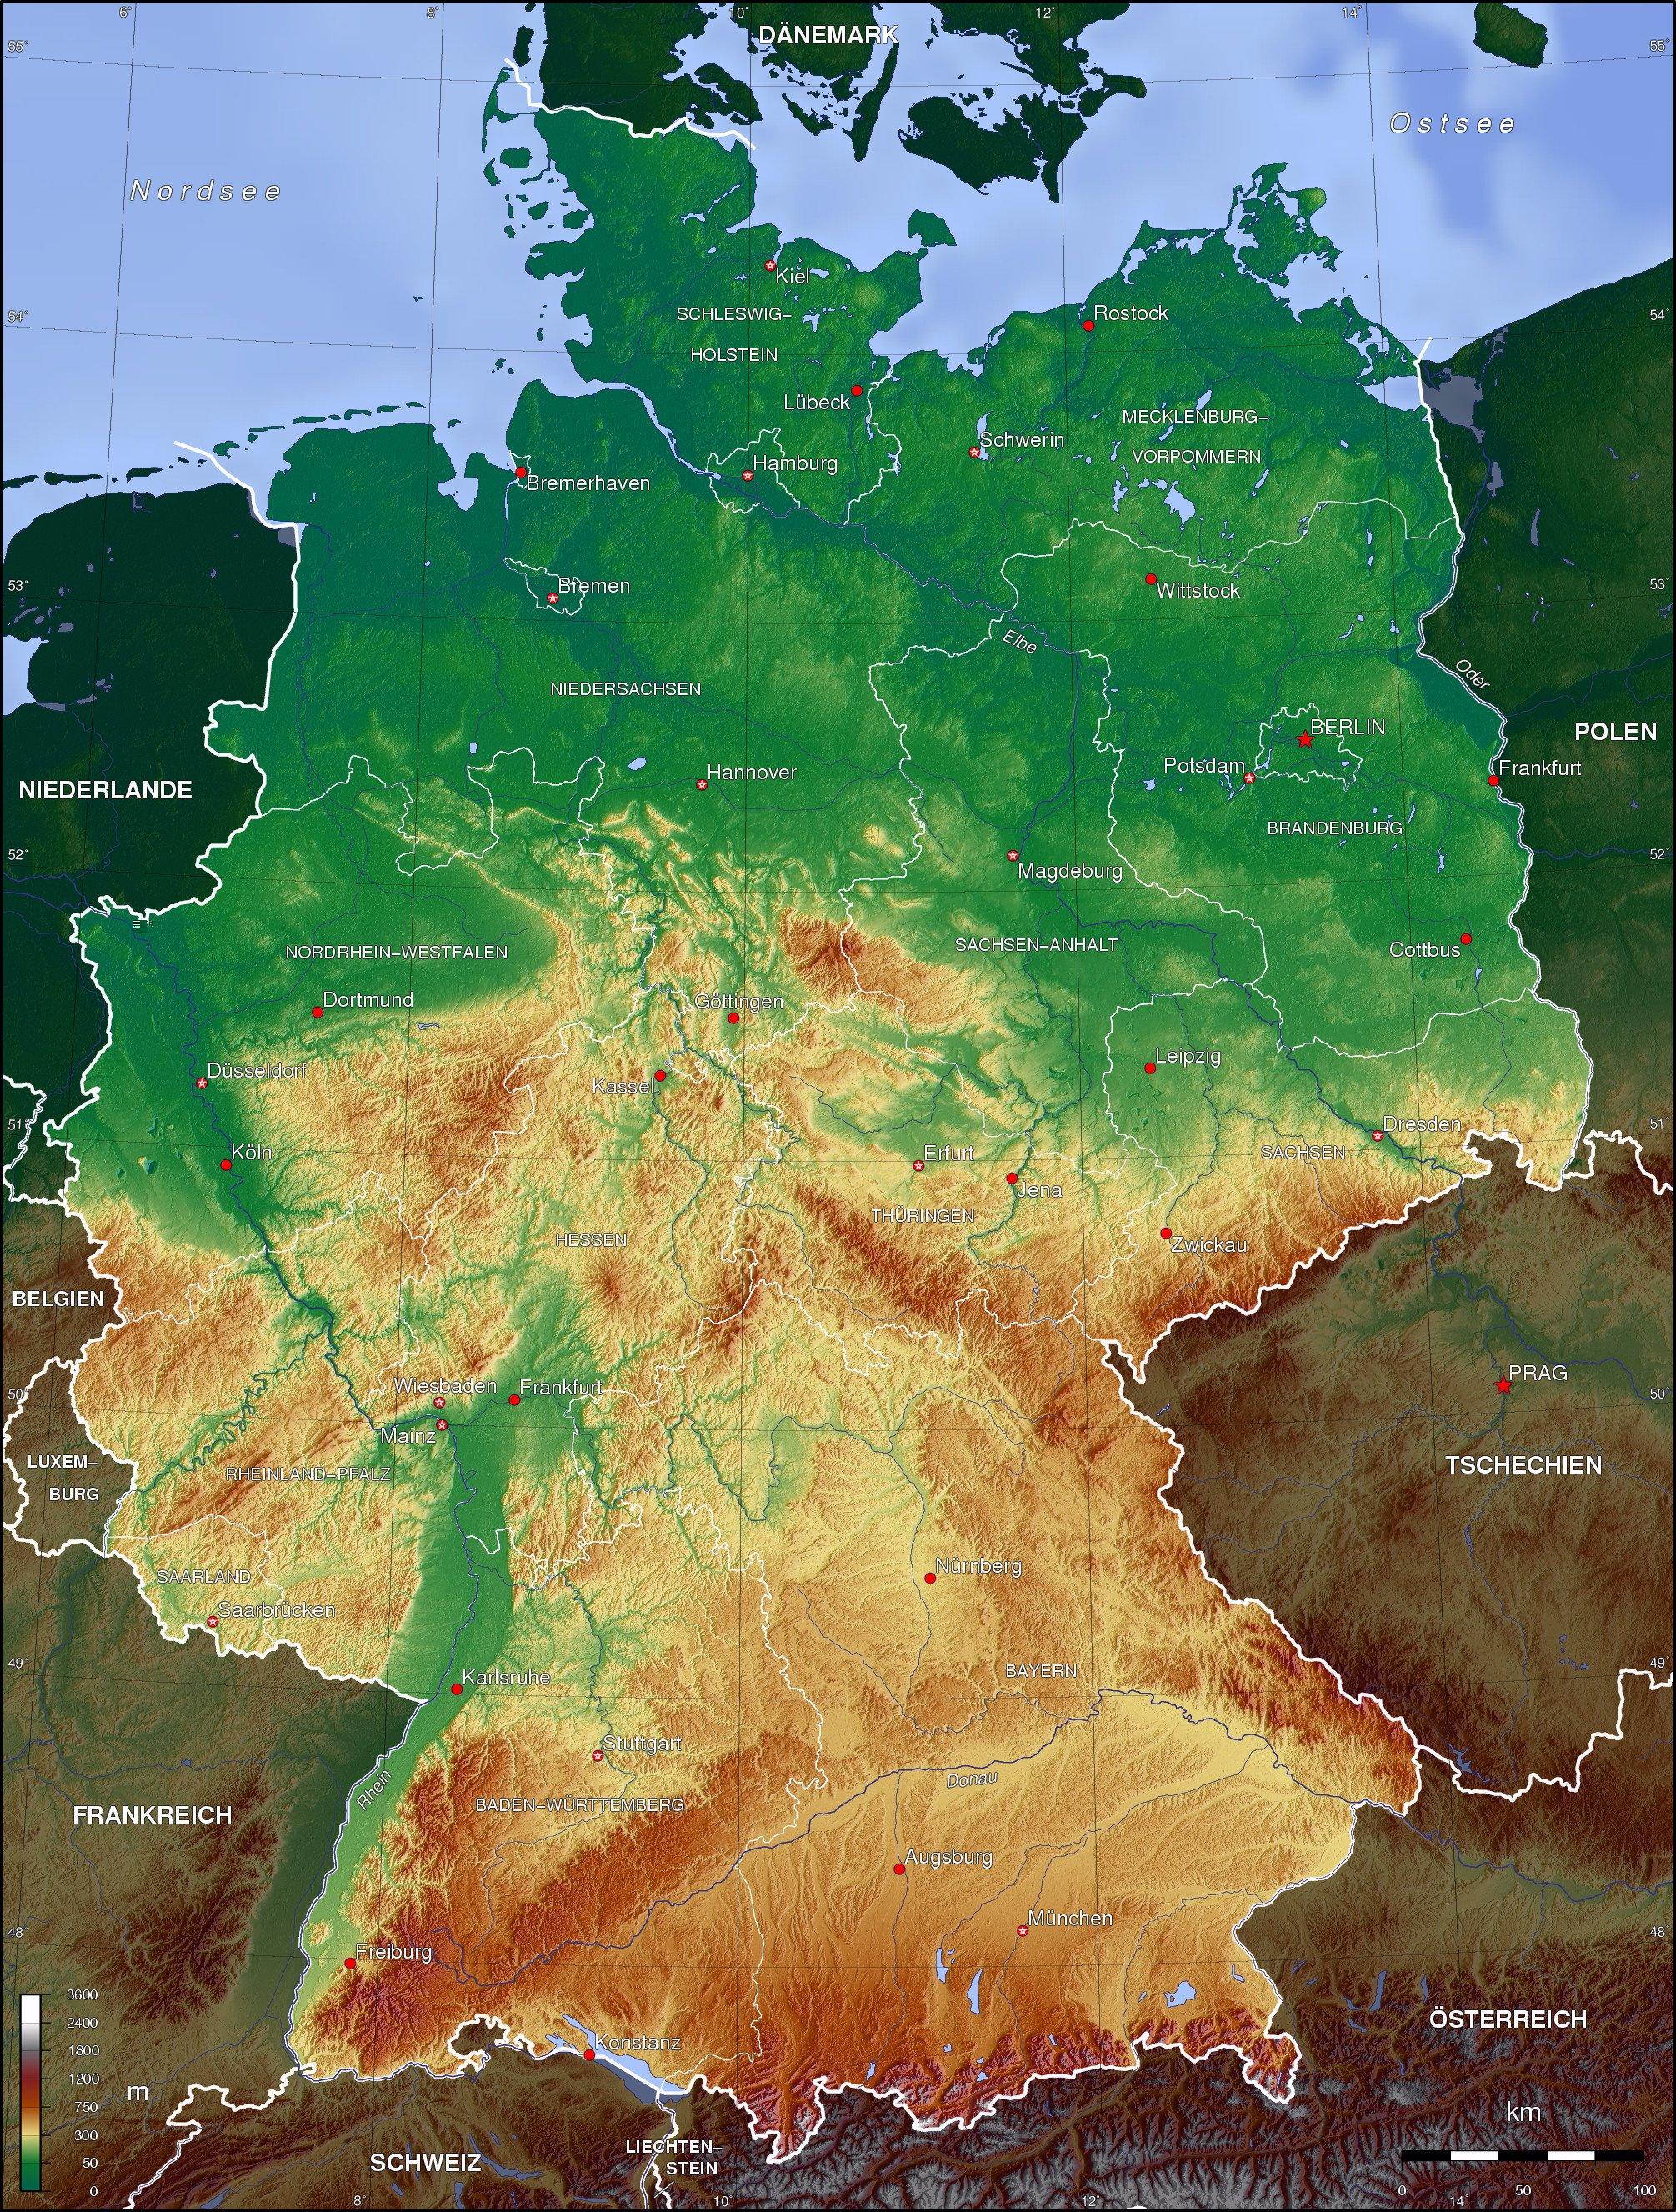 Germany topographic map 2006